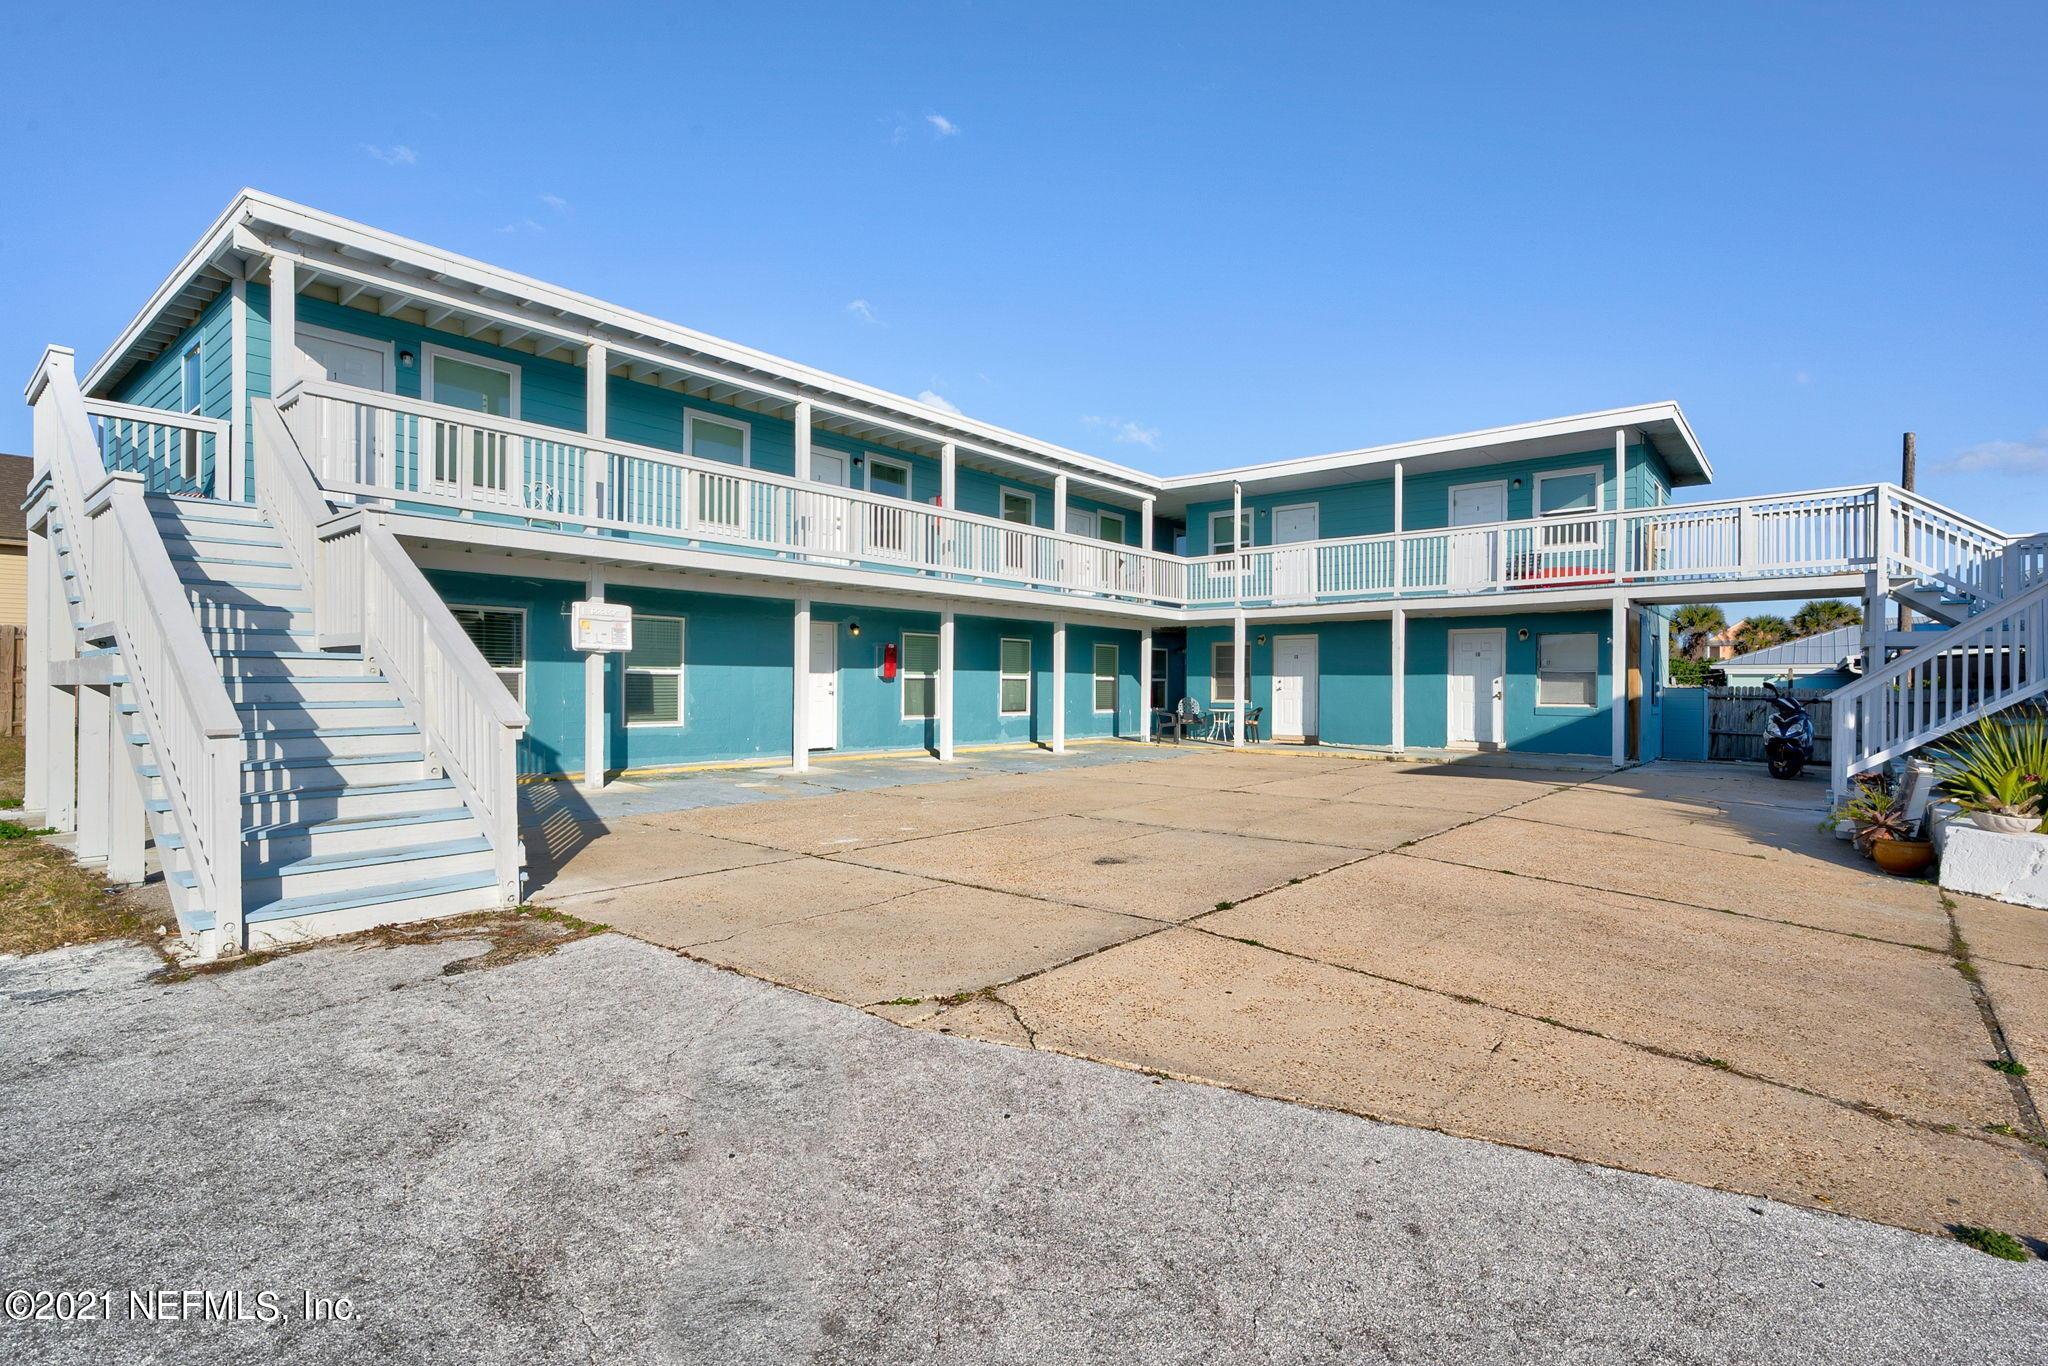 441 FLETCHER, FERNANDINA BEACH, FLORIDA 32034, 14 Bedrooms Bedrooms, ,14 BathroomsBathrooms,Investment / MultiFamily,For sale,FLETCHER,1092624